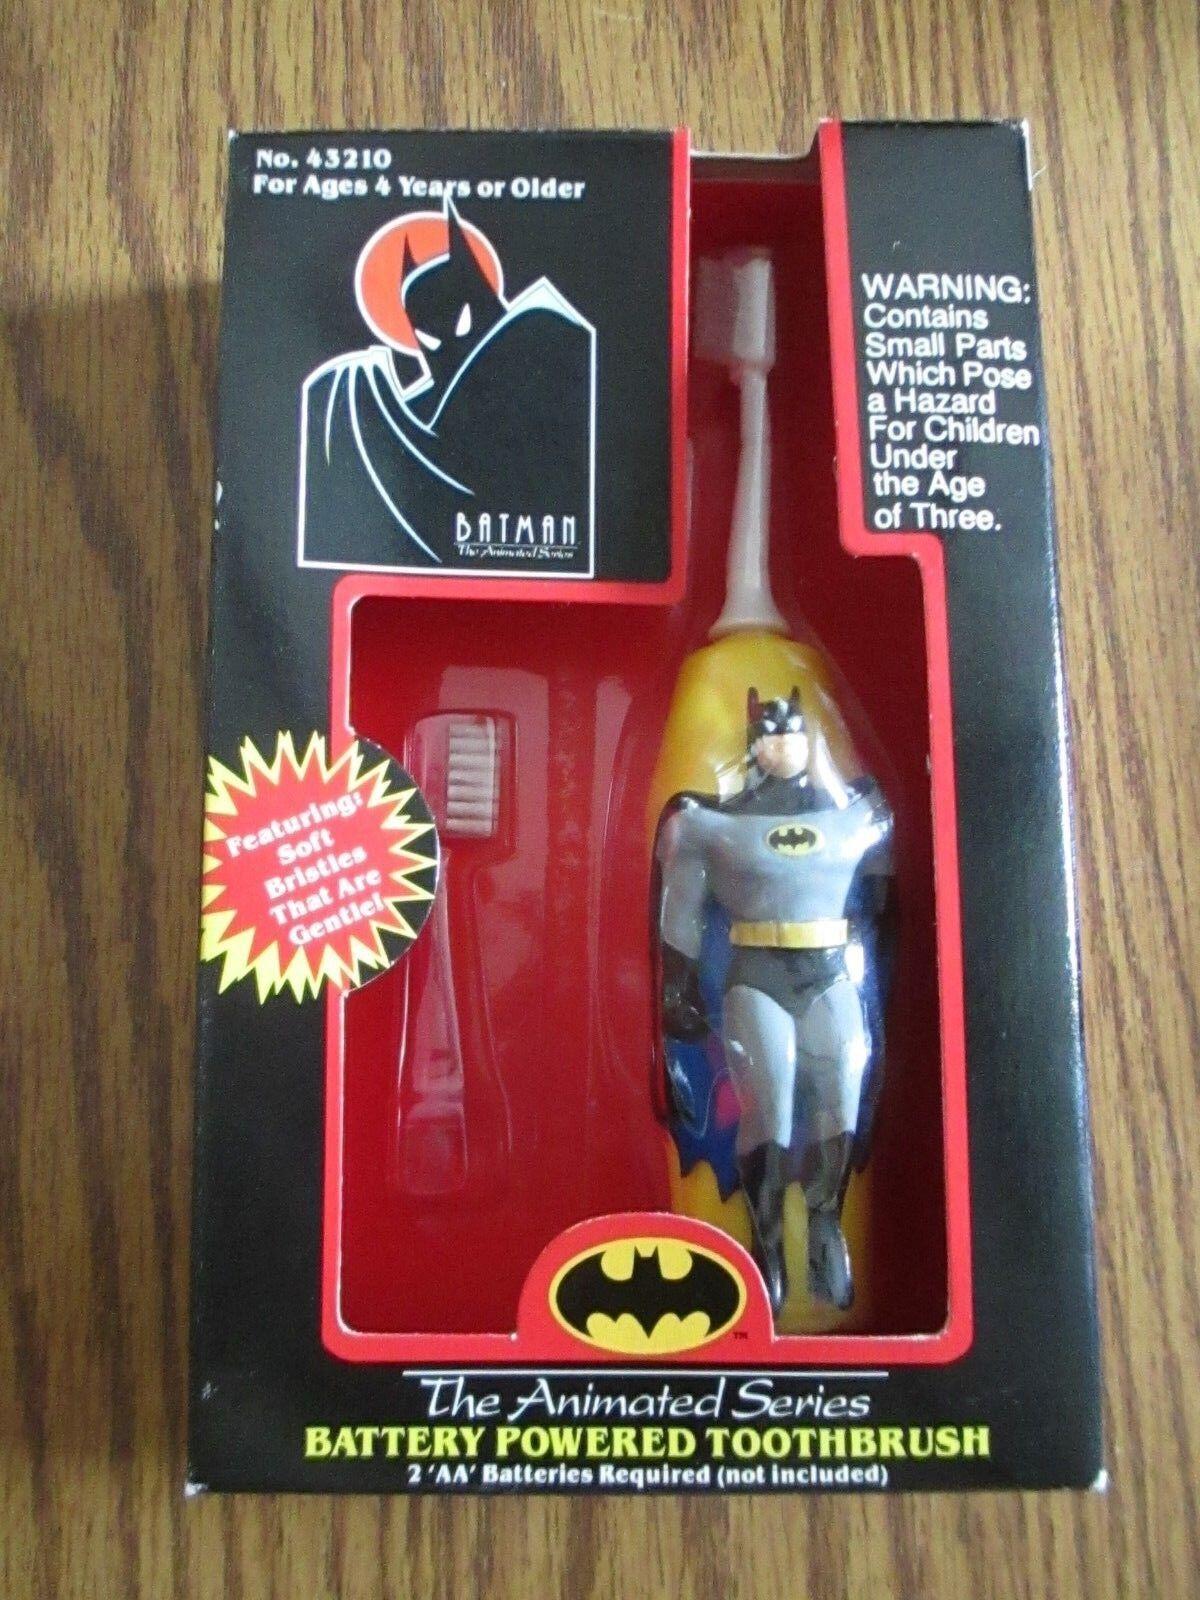 1993 Janex DC Comics Batman The Animated Serie Cepillo de dientes alimentado por batería